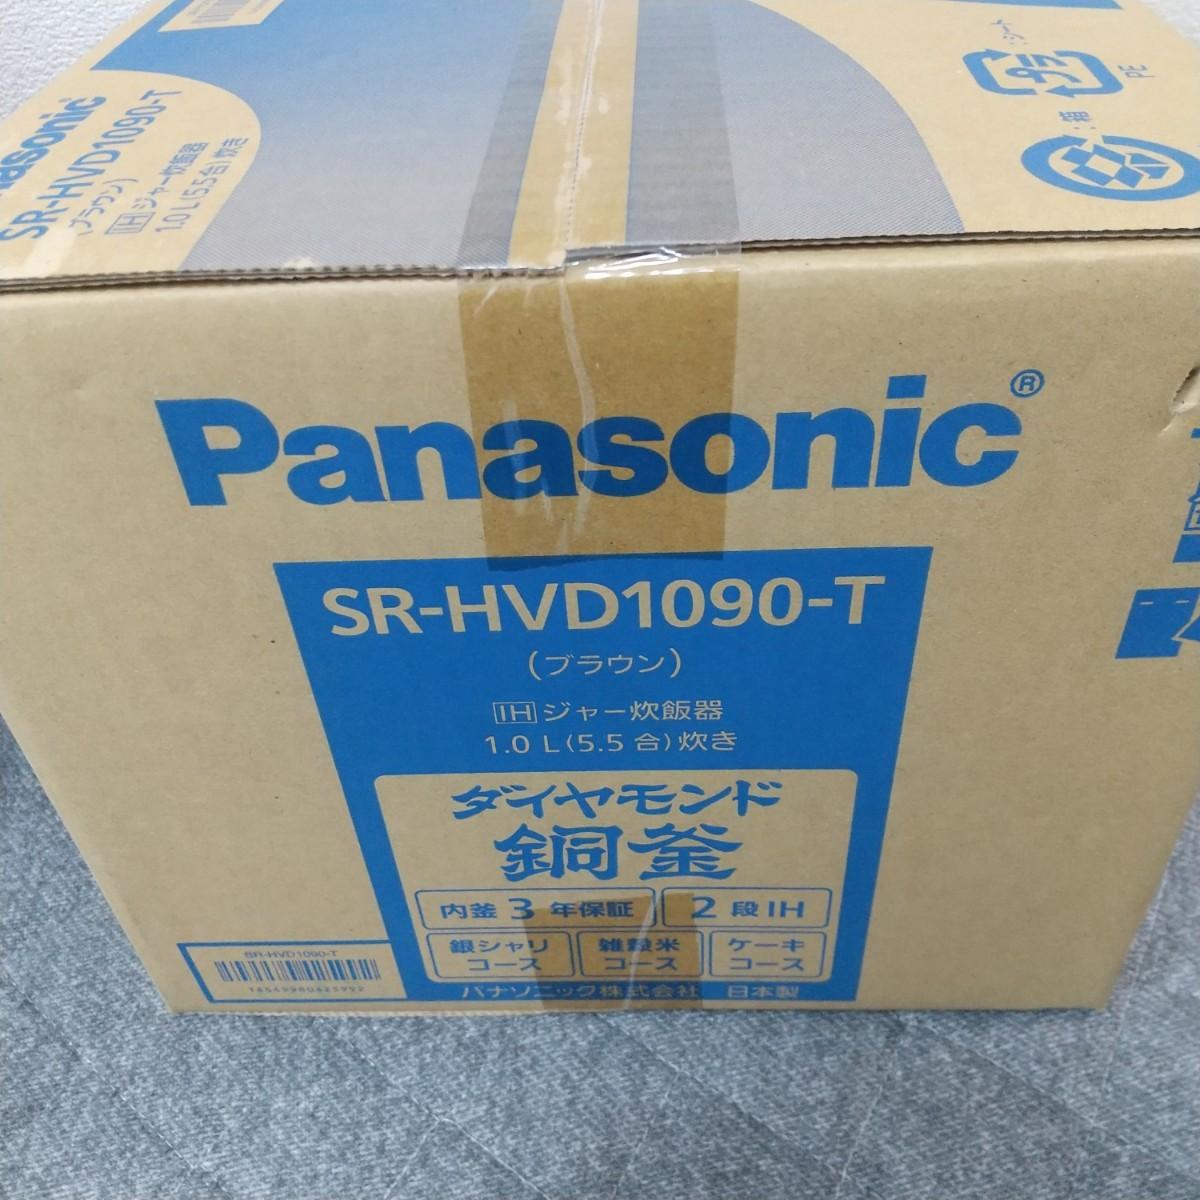 Panasonic 炊飯器5.5合 sr-hvd1090 IH